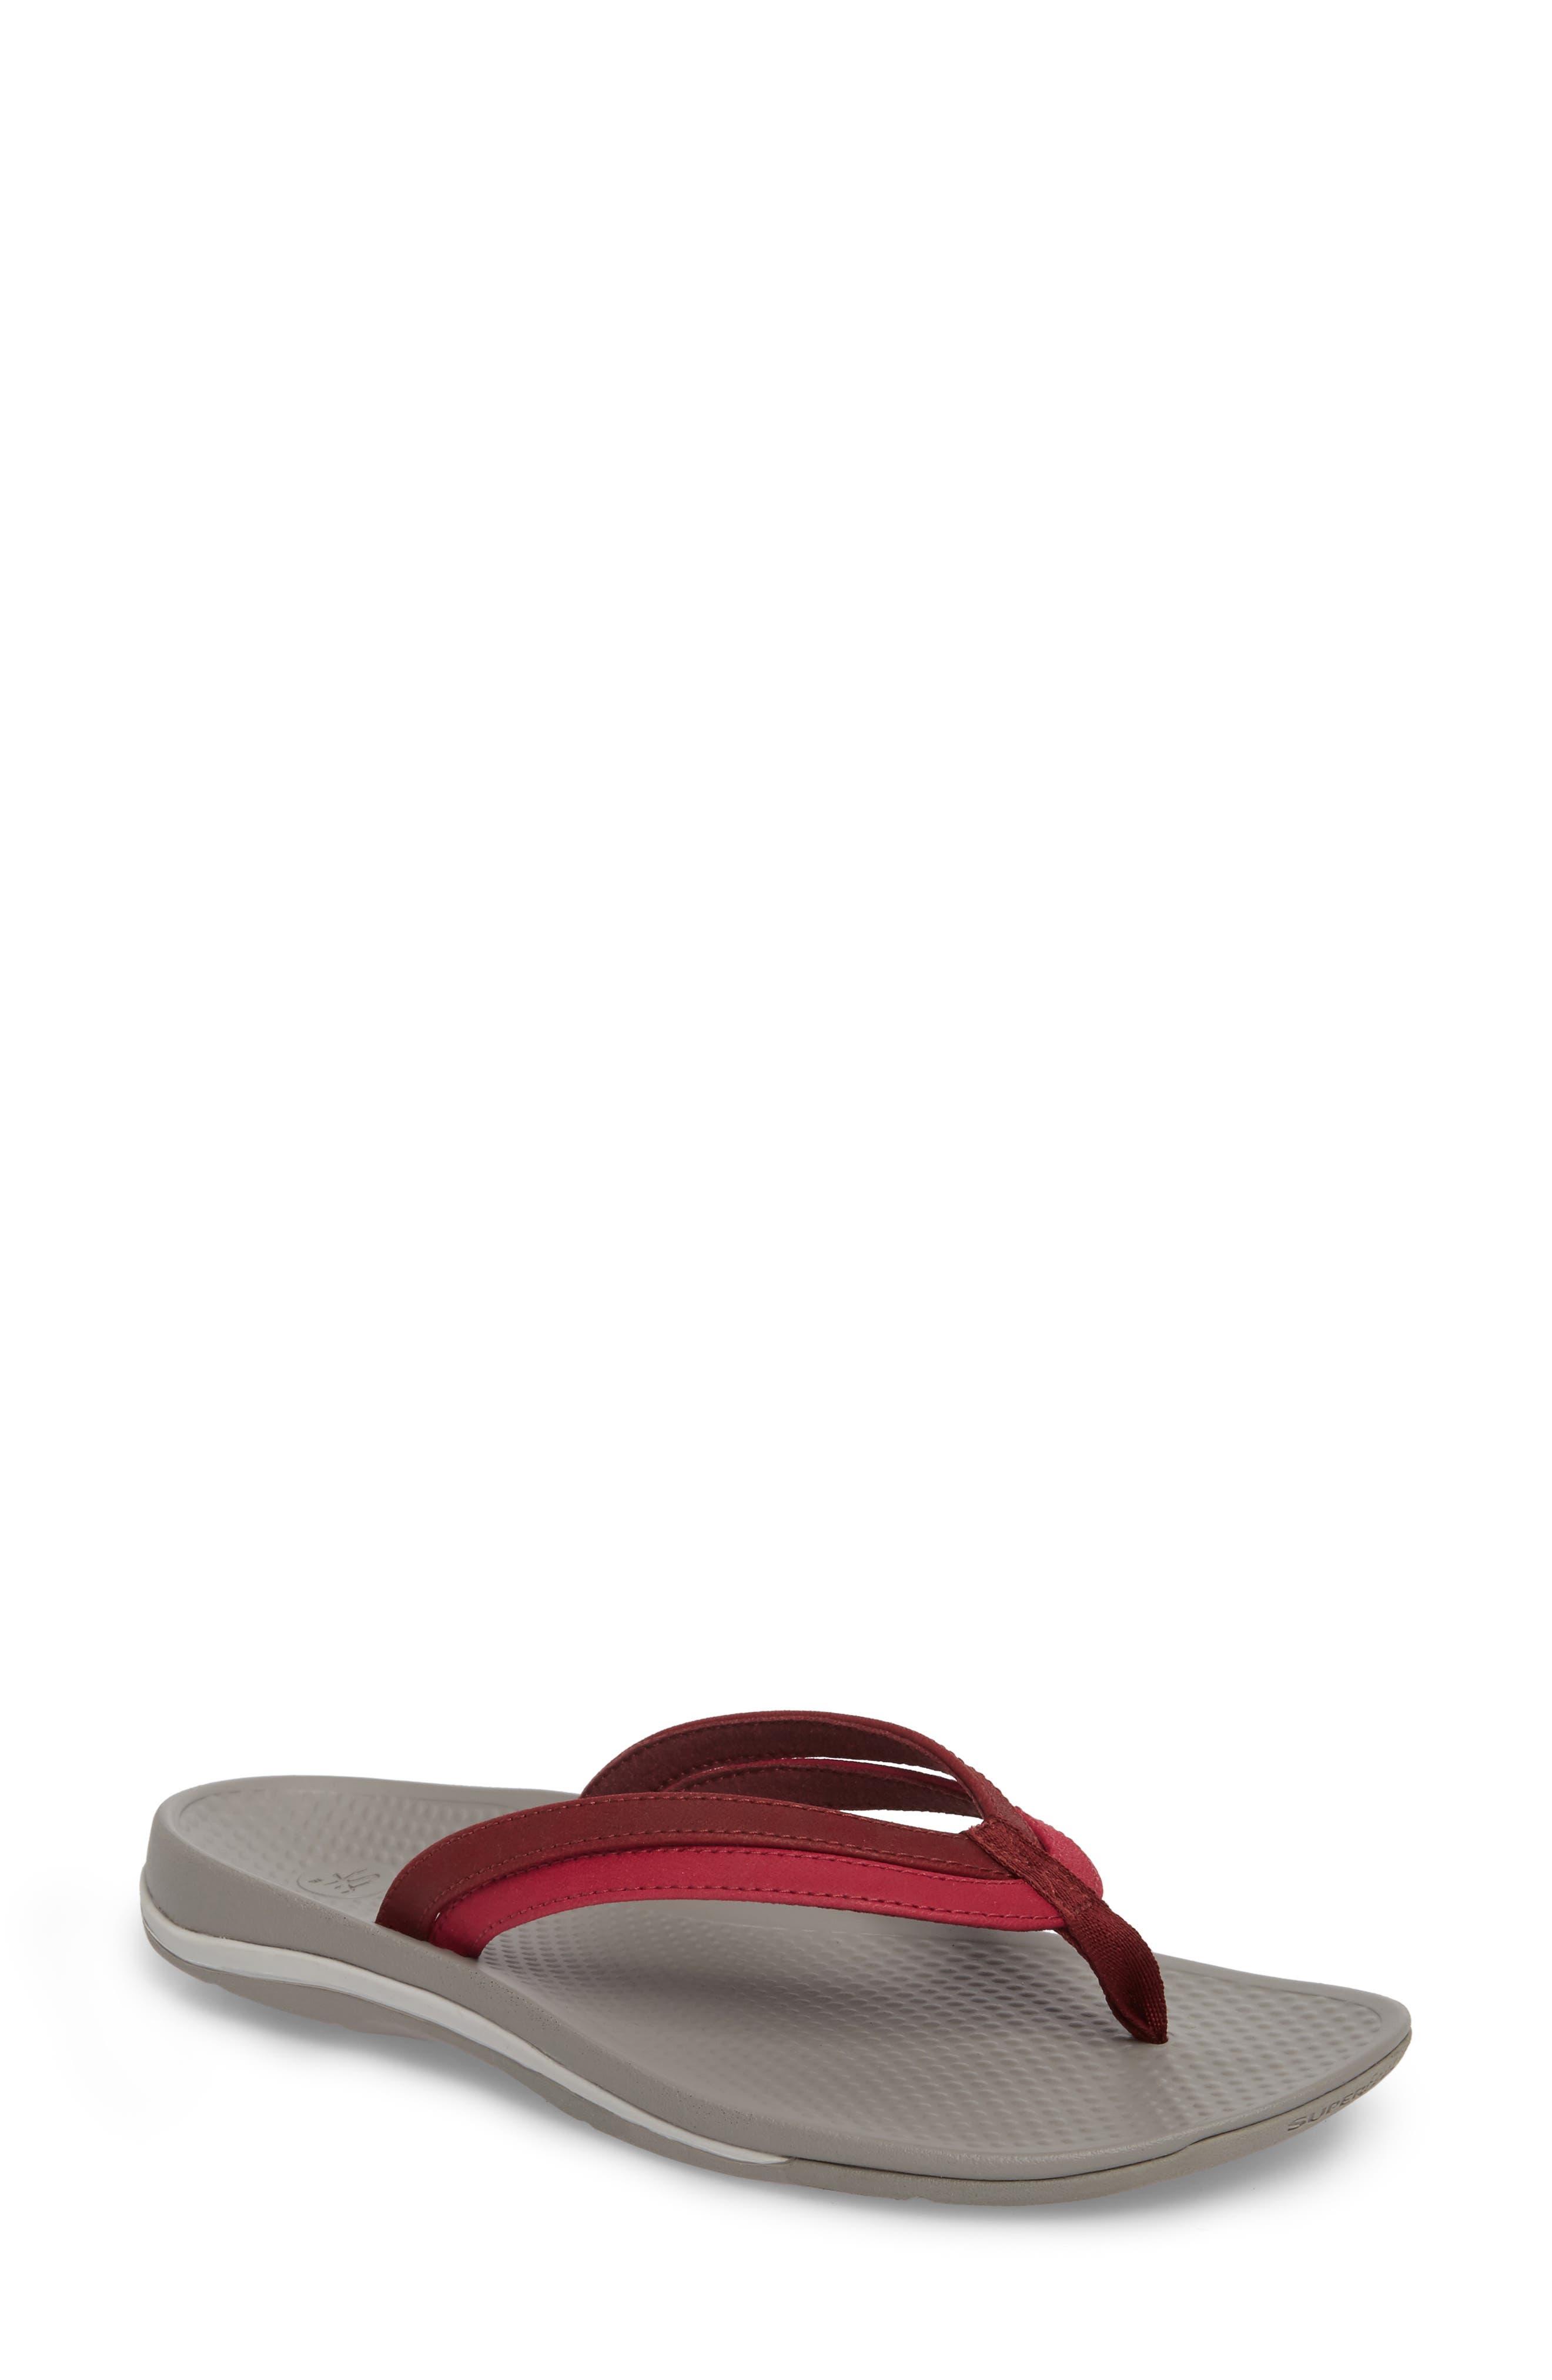 Rose Flip Flop,                         Main,                         color, Red Faux Leather